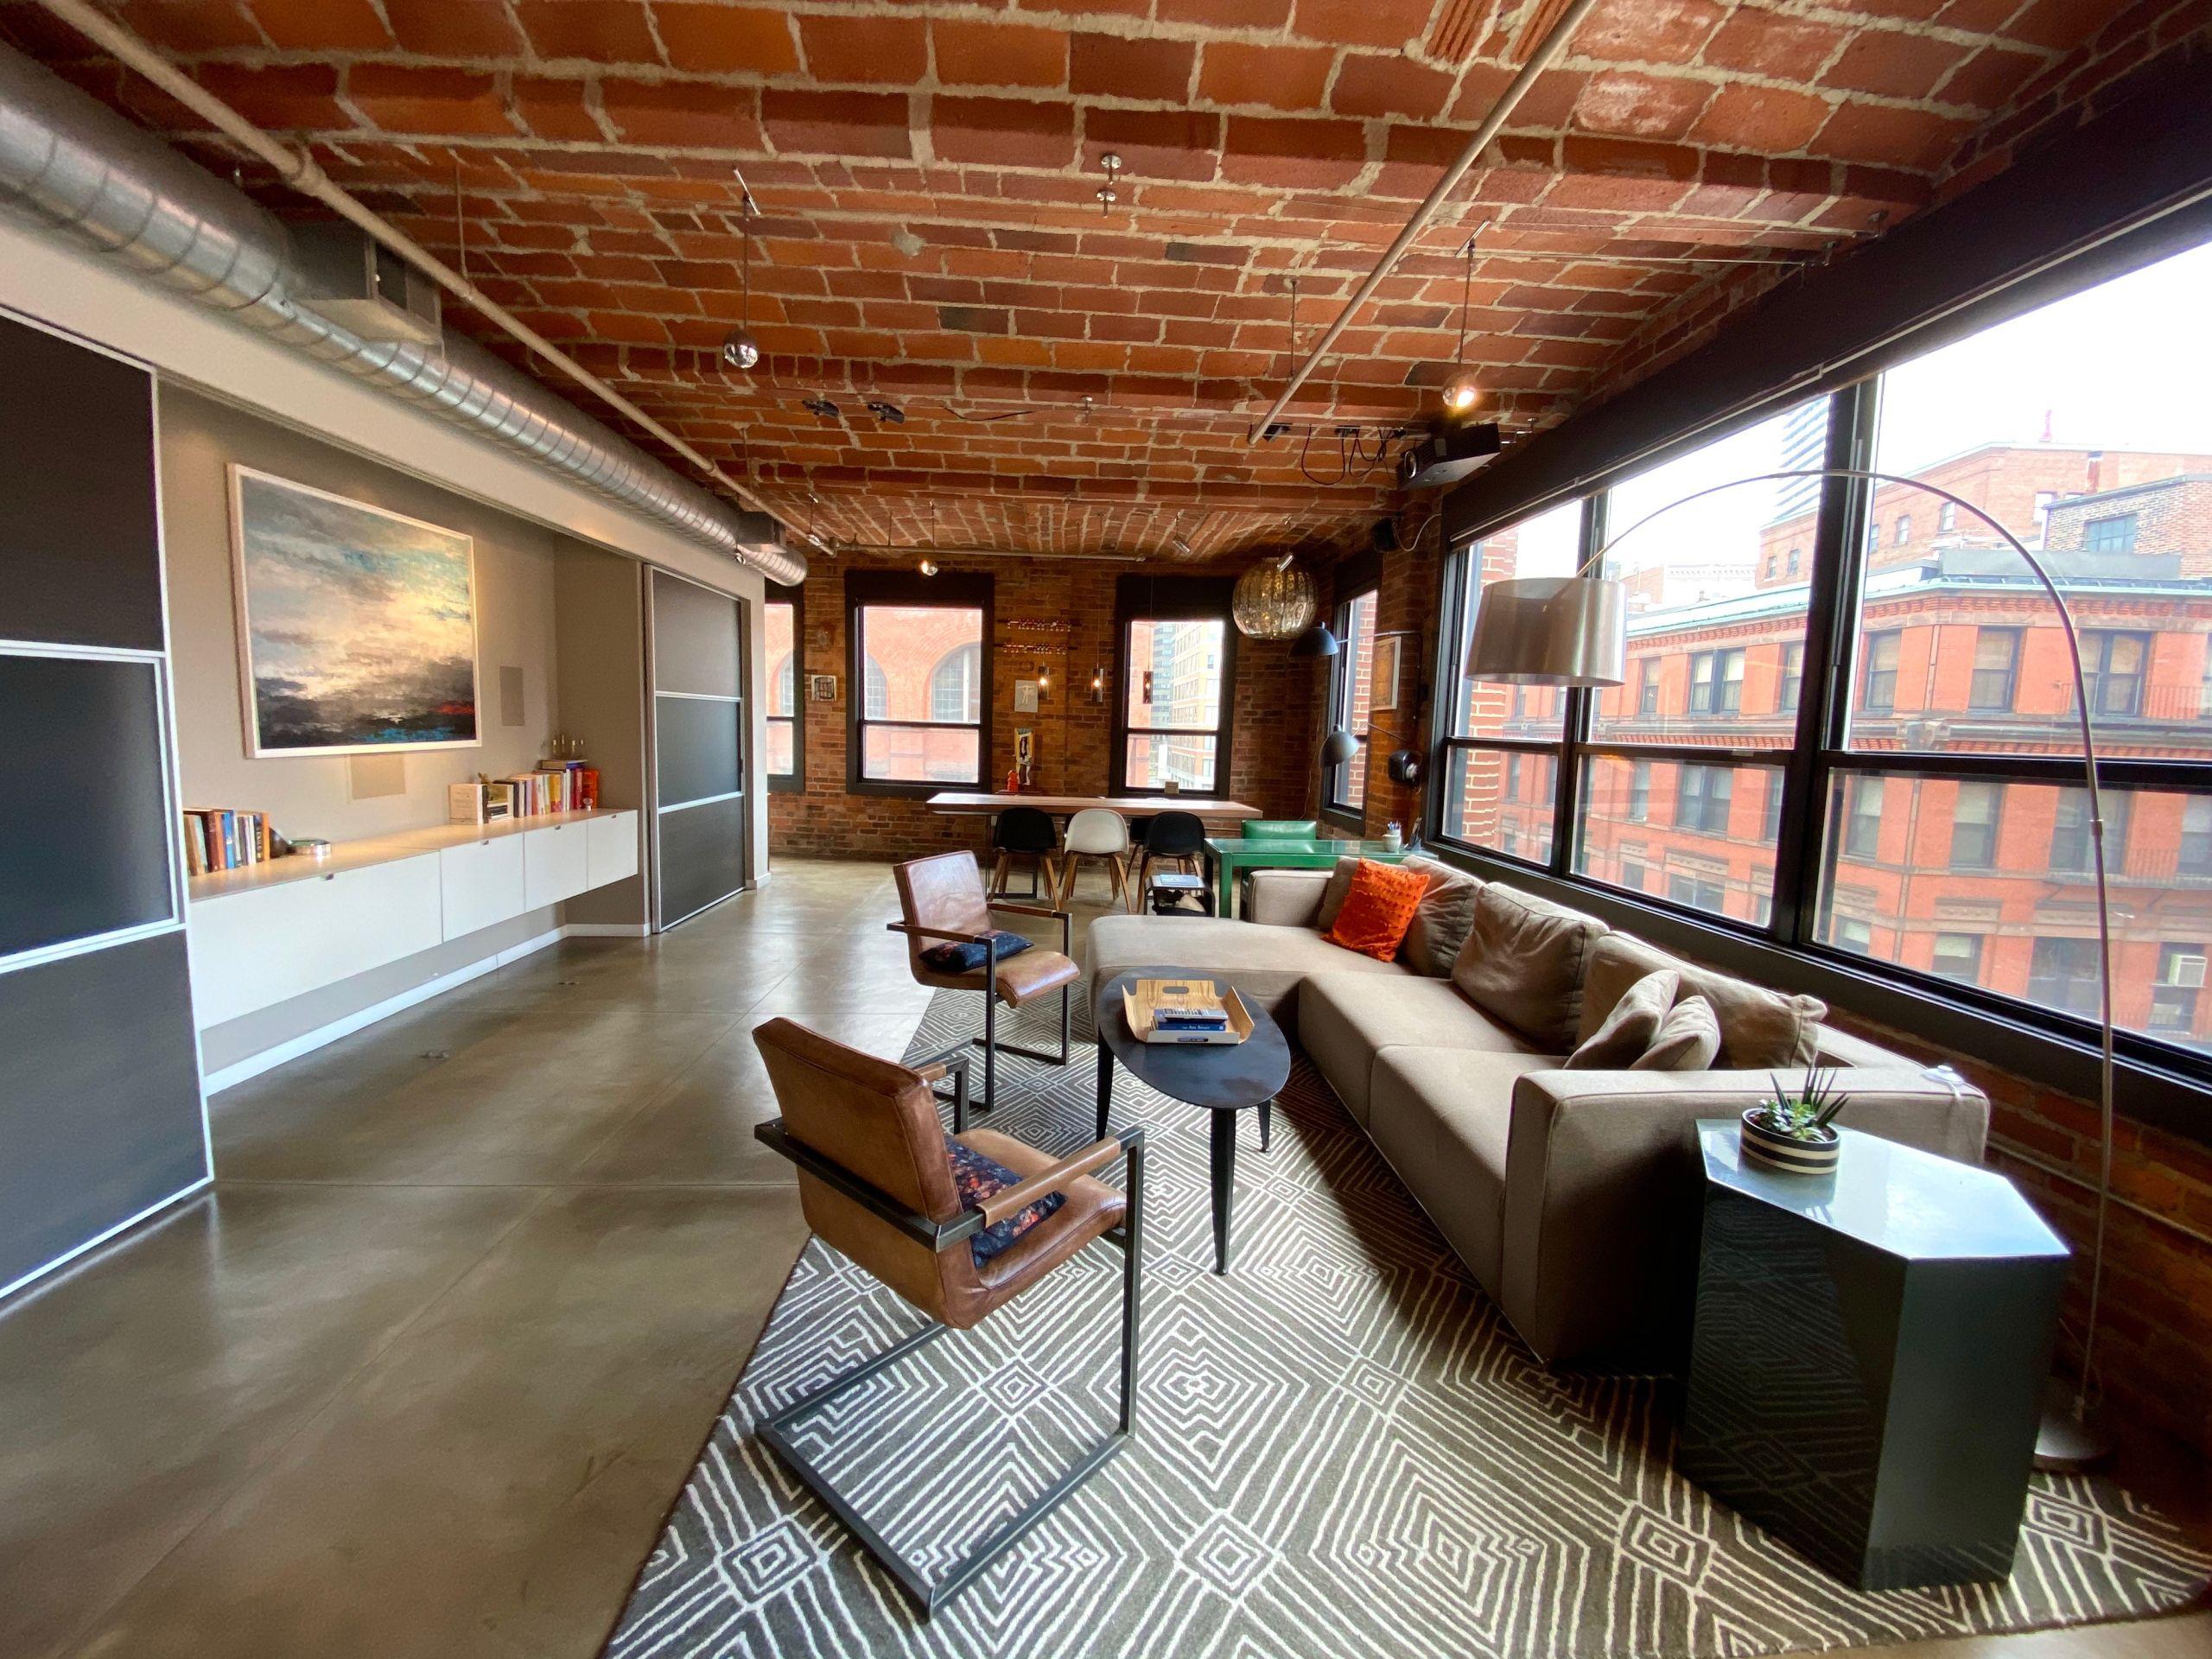 121 Beach Street, Unit 501 Leather District Boston MA 02111